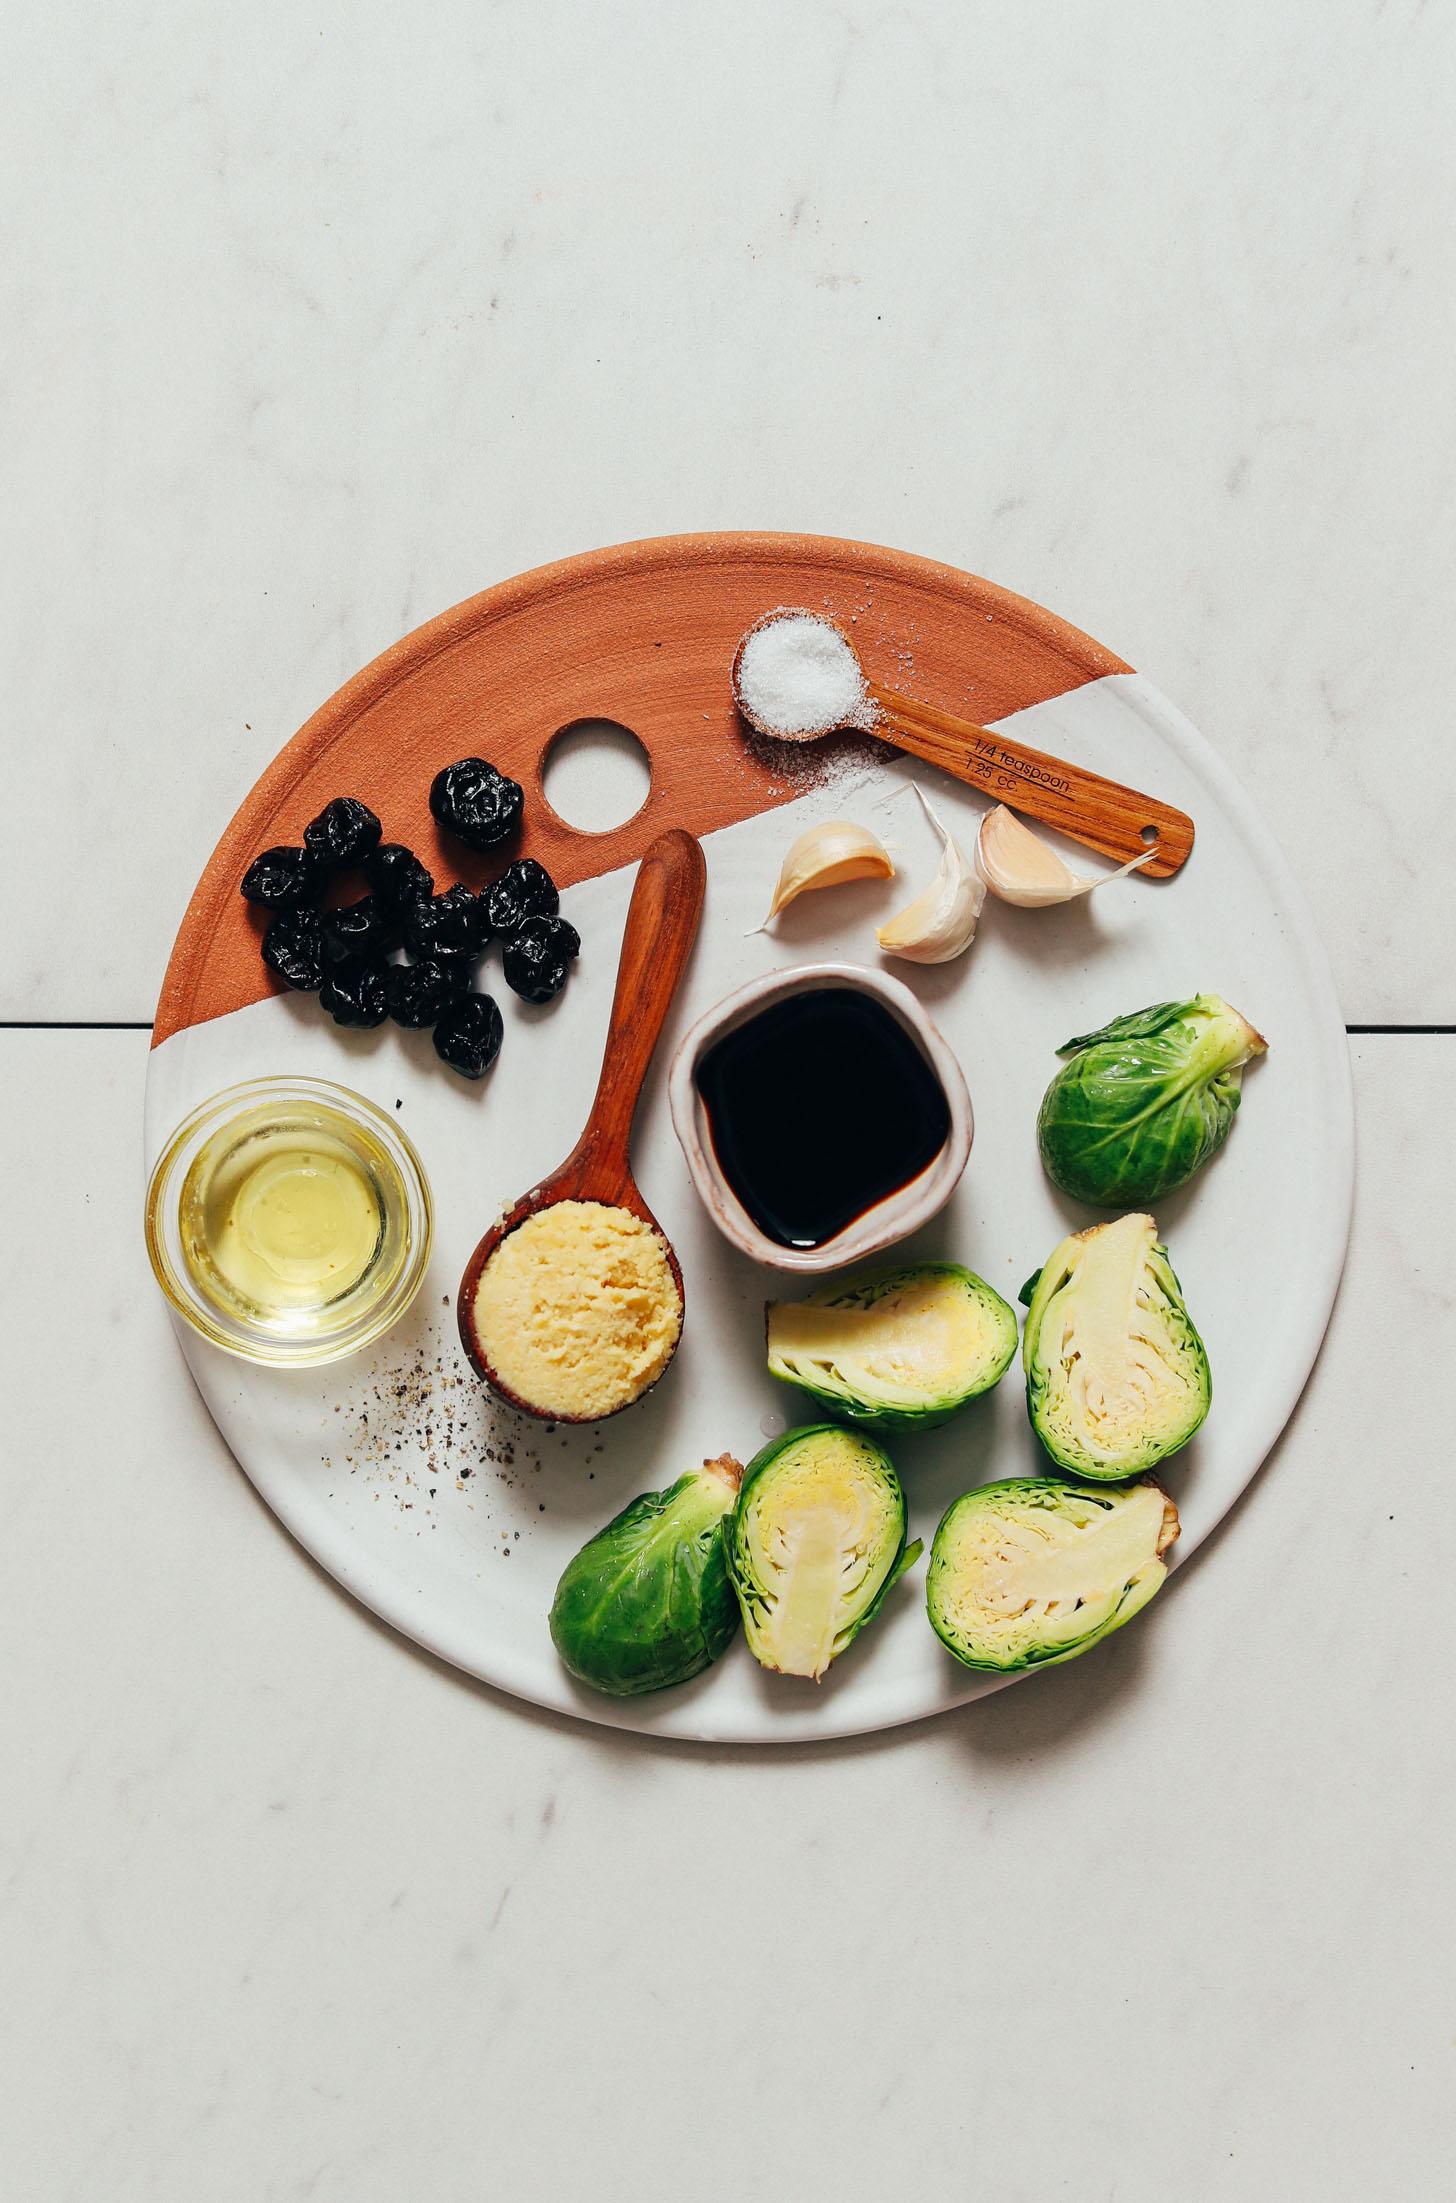 Dried cherries, sea salt, garlic, balsamic vinegar, Brussels sprouts, macadamia nut cheese, black pepper and avocado oil